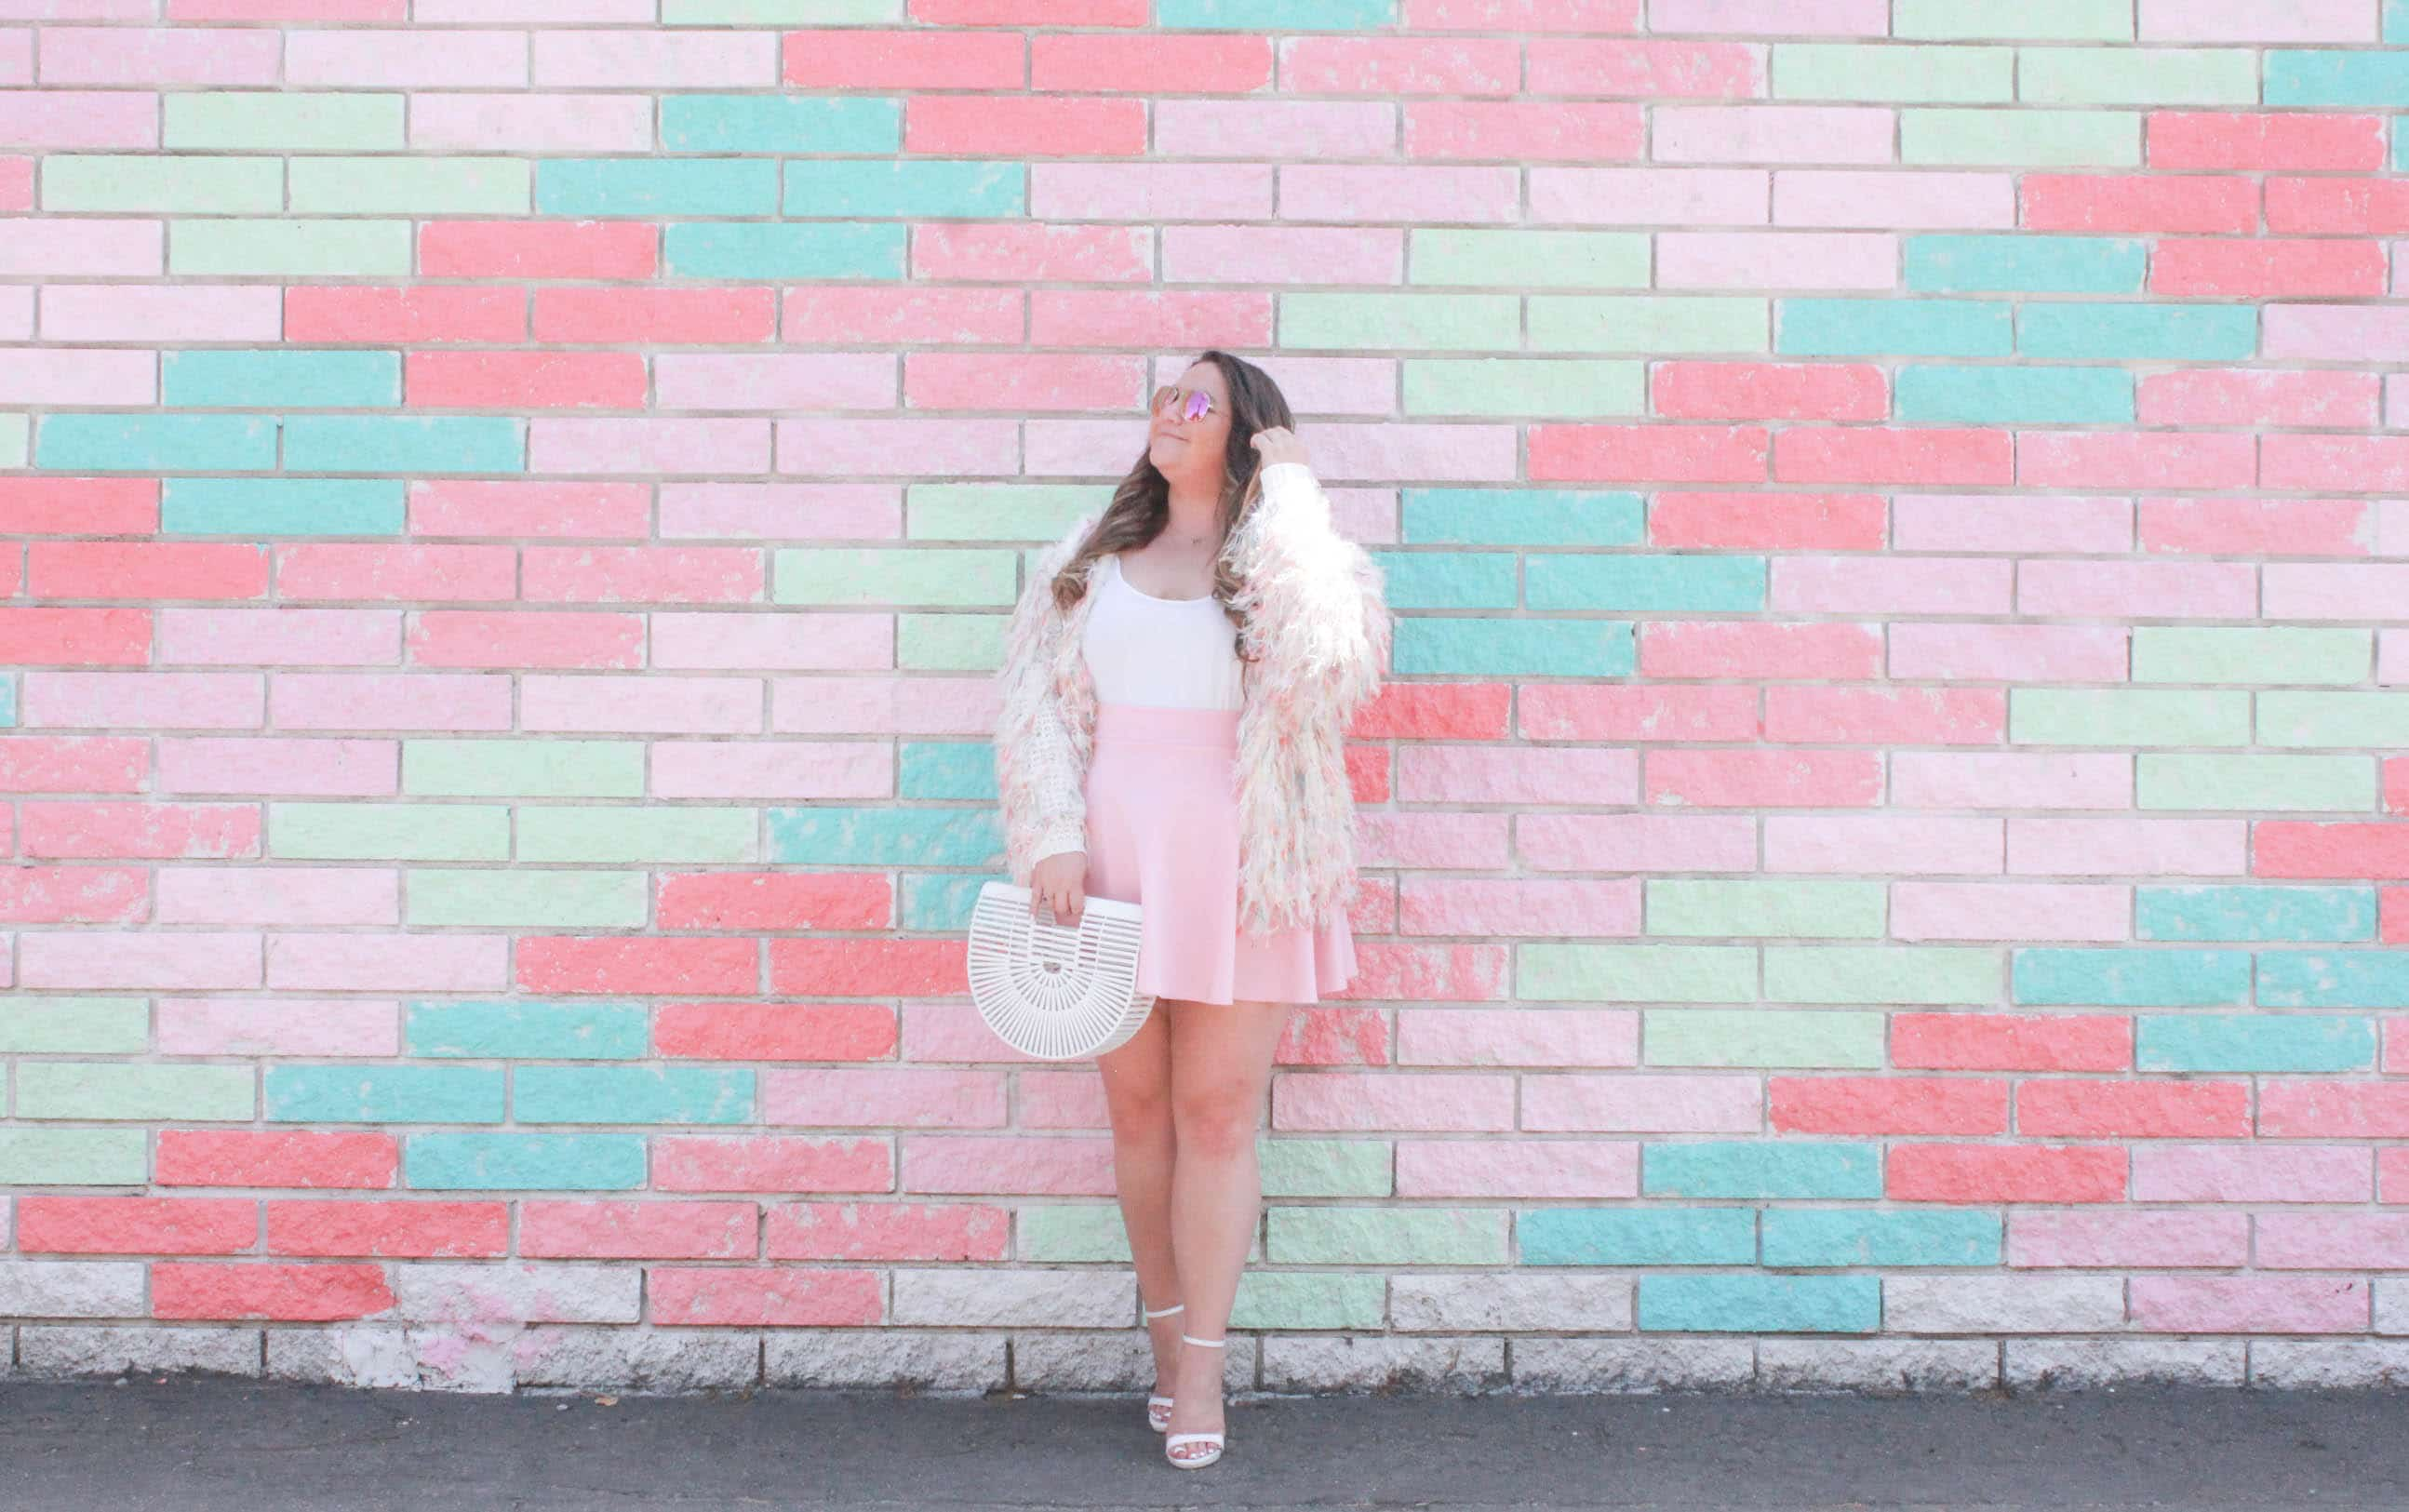 missyonmadison, missyonmadison blog, missyonmadison blogger, outfit inspo, outfit inspiration, blogger, fashion blogger, style blogger, style blog, fashion blog, fashion blogger, melissa tierney, melissa tierney blog, melissa tierney blogger, currently wearing, style blog, style blogger, fashion blogger, fashion blog, la blogger, fringe cardigan, olive and pepper, rainbow fringe cardigan, white ankle strap heels, white ankle strap sandals, pink skater skirt, pink skirt, white chiffon camisole, white camisole, white fringe cardigan, white cult gaia bag, white ark bag, raybans, rayban aviators, bloglovin, blogger style,